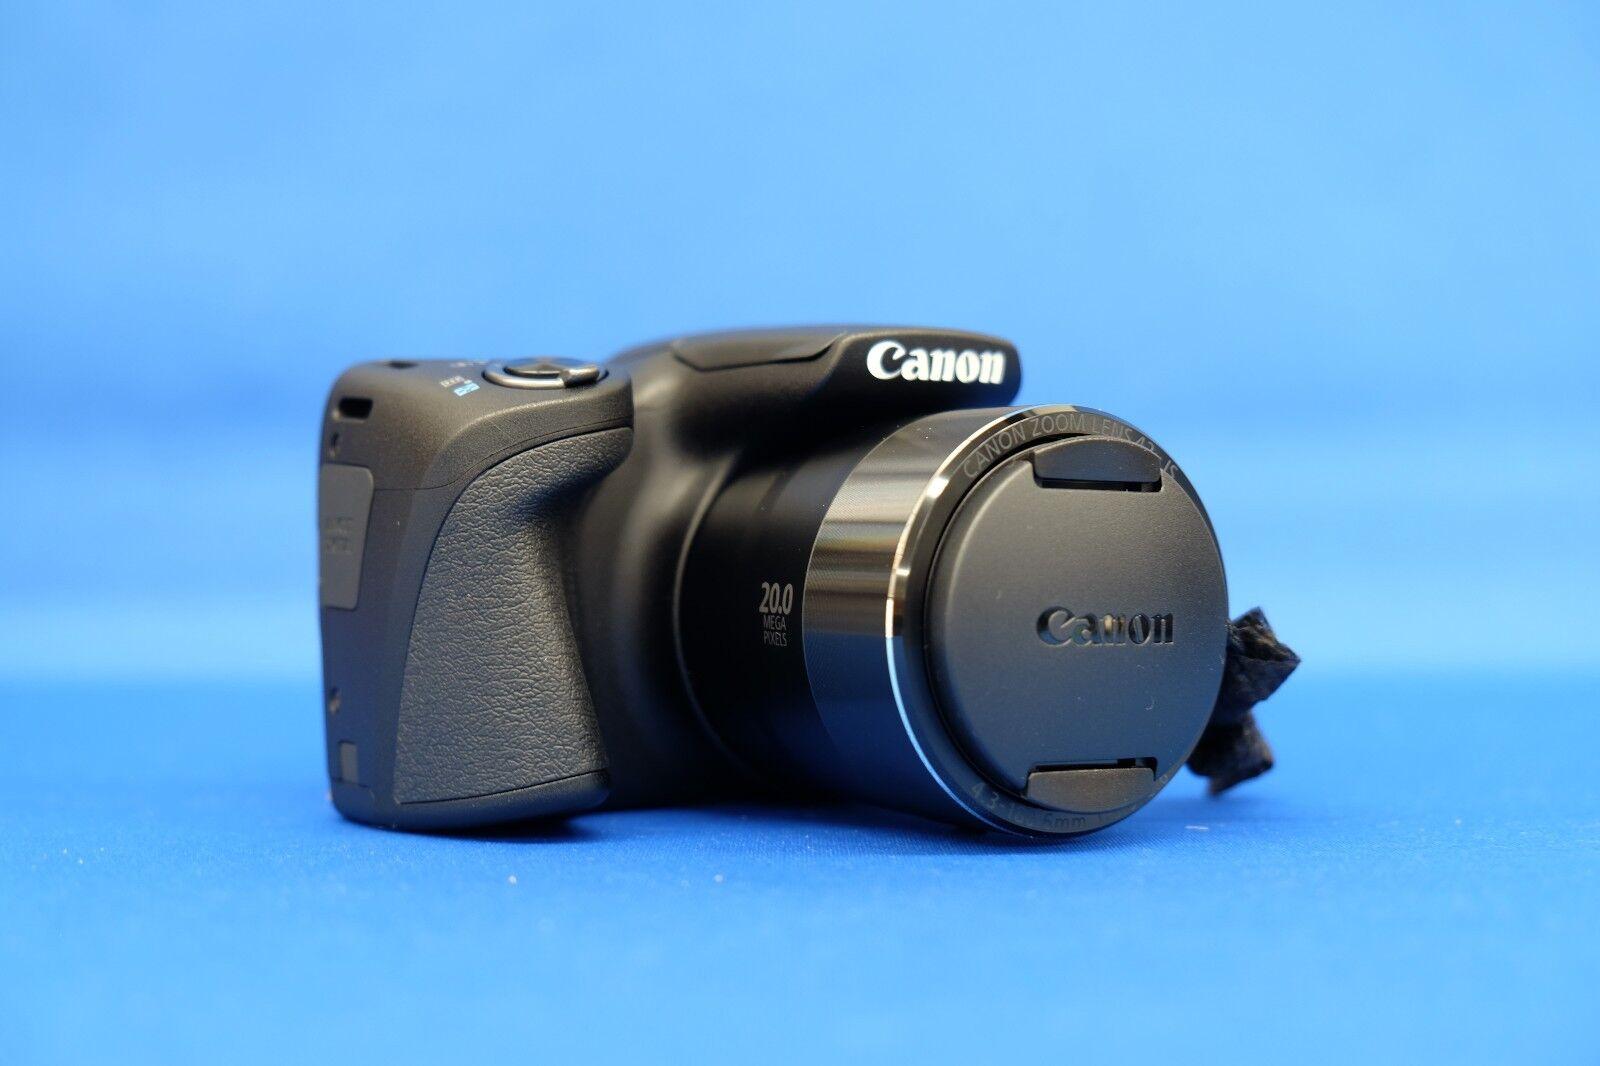 как выглядит Фотоаппарат CANON PowerShot SX420 IS Black 20MP Digital Camera Japan Domestic Version New фото